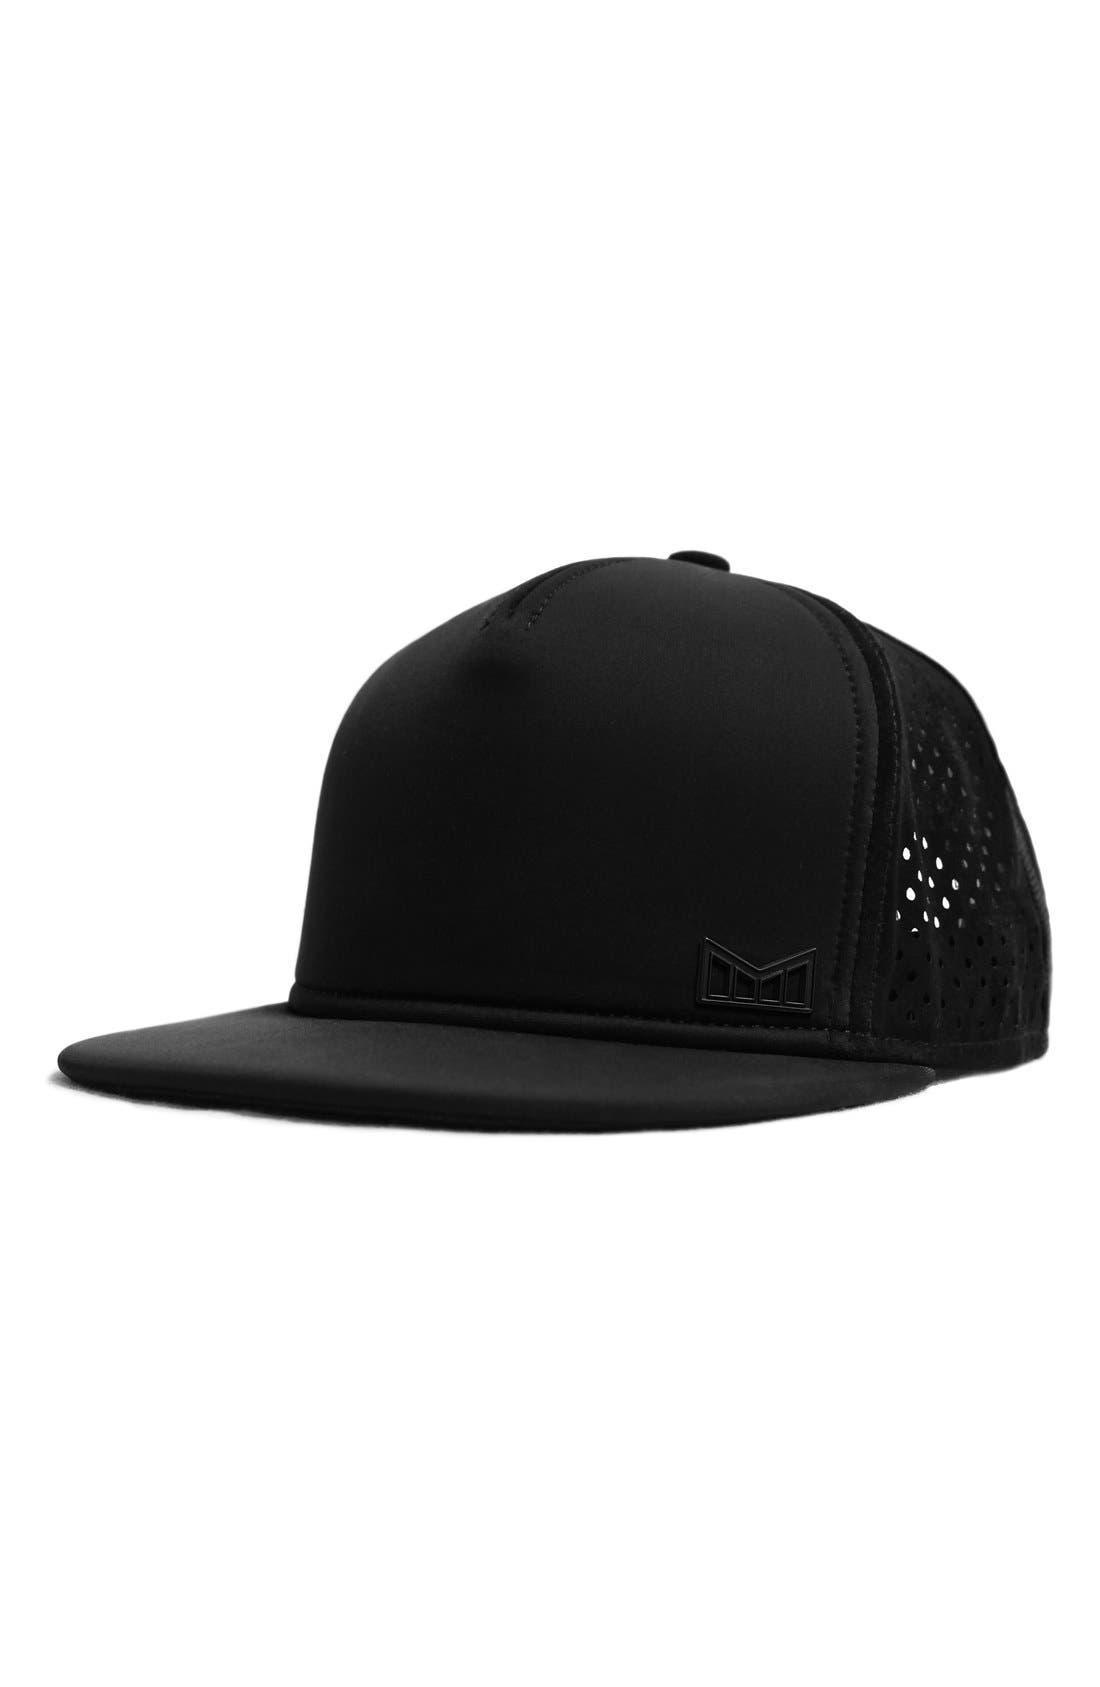 Alternate Image 1 Selected - Melin 'The Sharpshooter' Snapback Baseball Cap